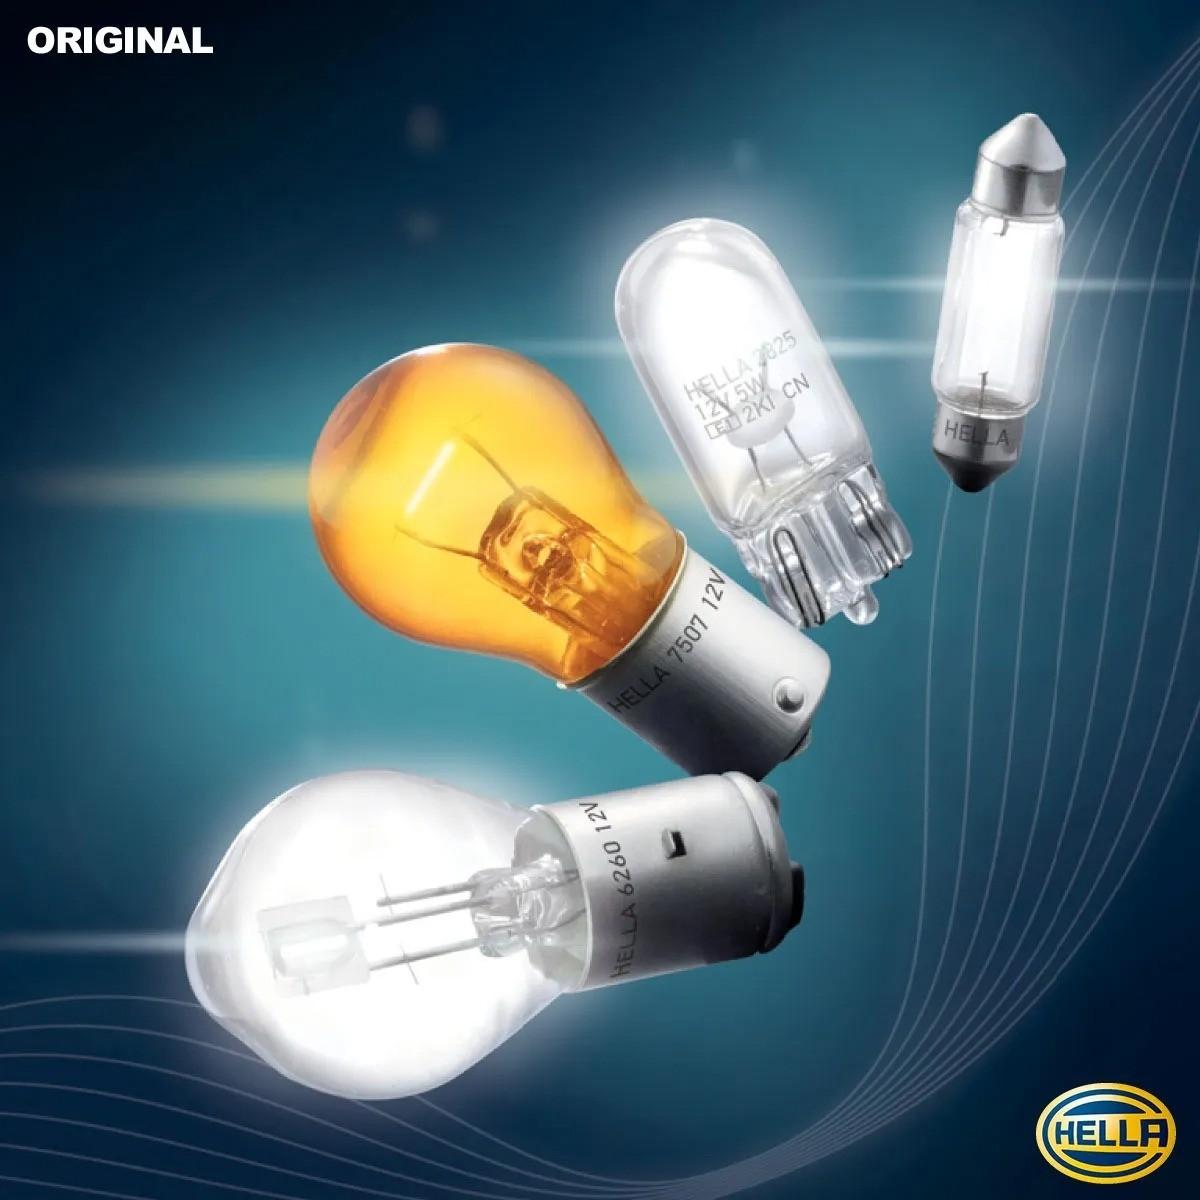 LAMPADA CONVENCIONAL 24V 70W FAROL H3 UNIVERSAL HELLA